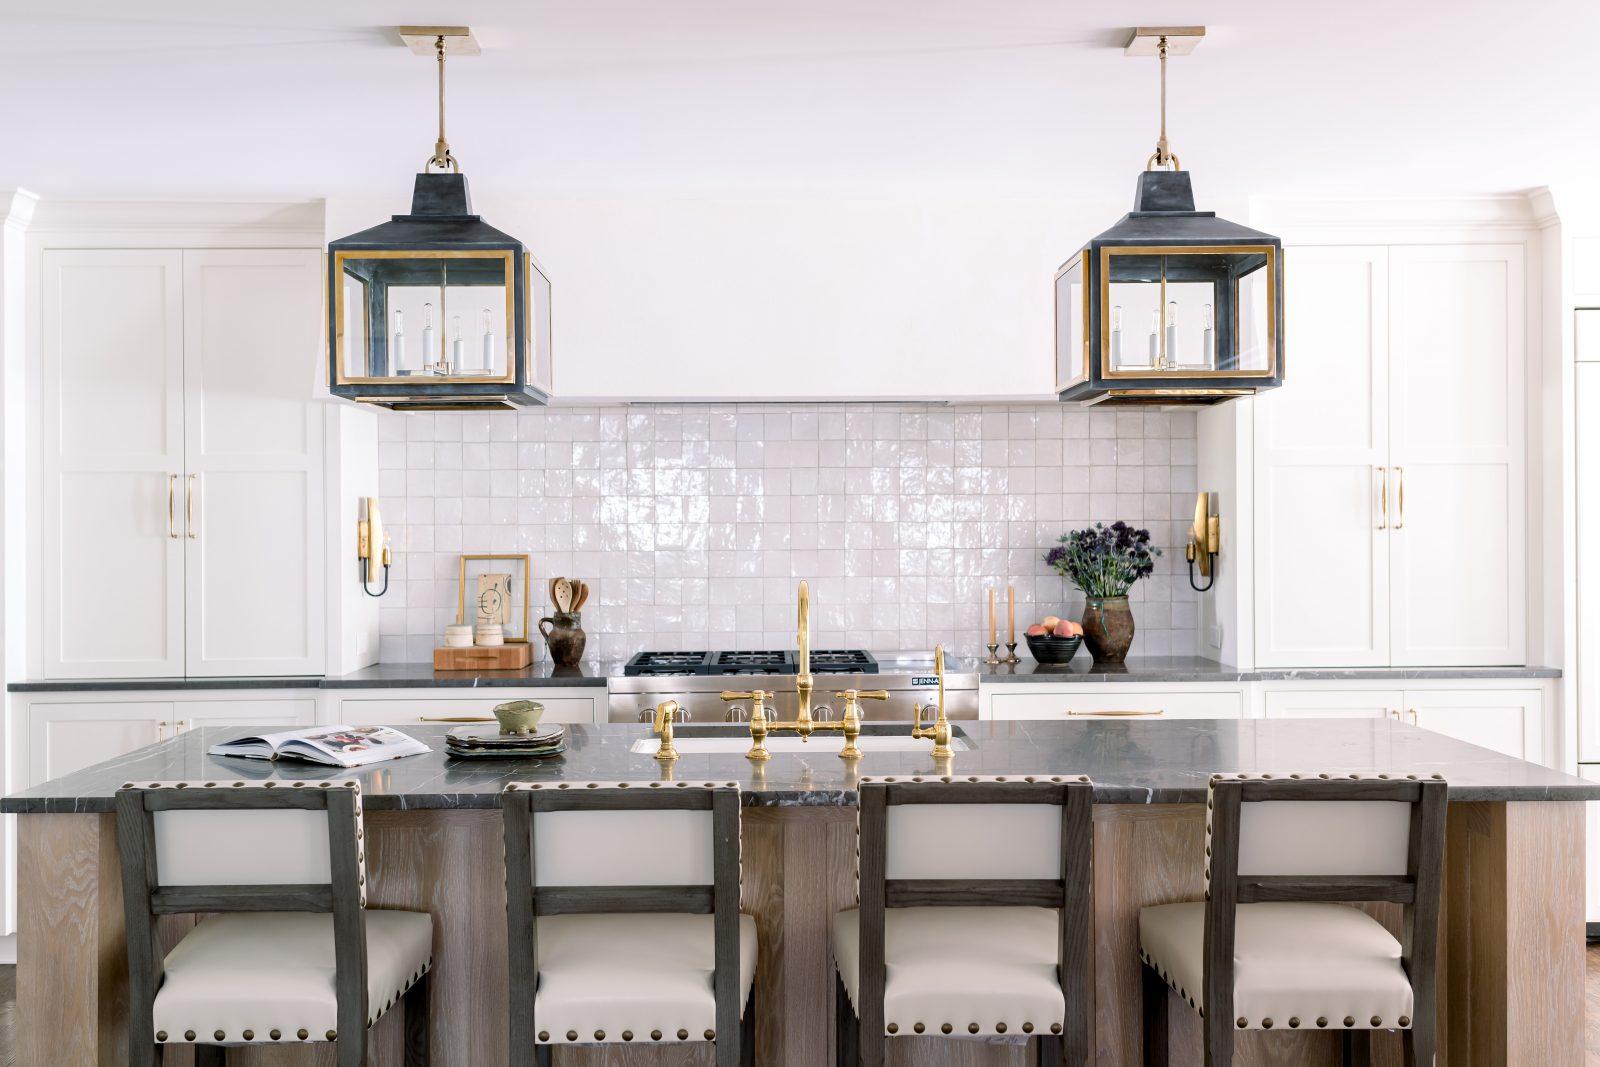 Finished Parkes and Lamb kitchen interiors, white painted cabinets, white distressed tile backsplash.